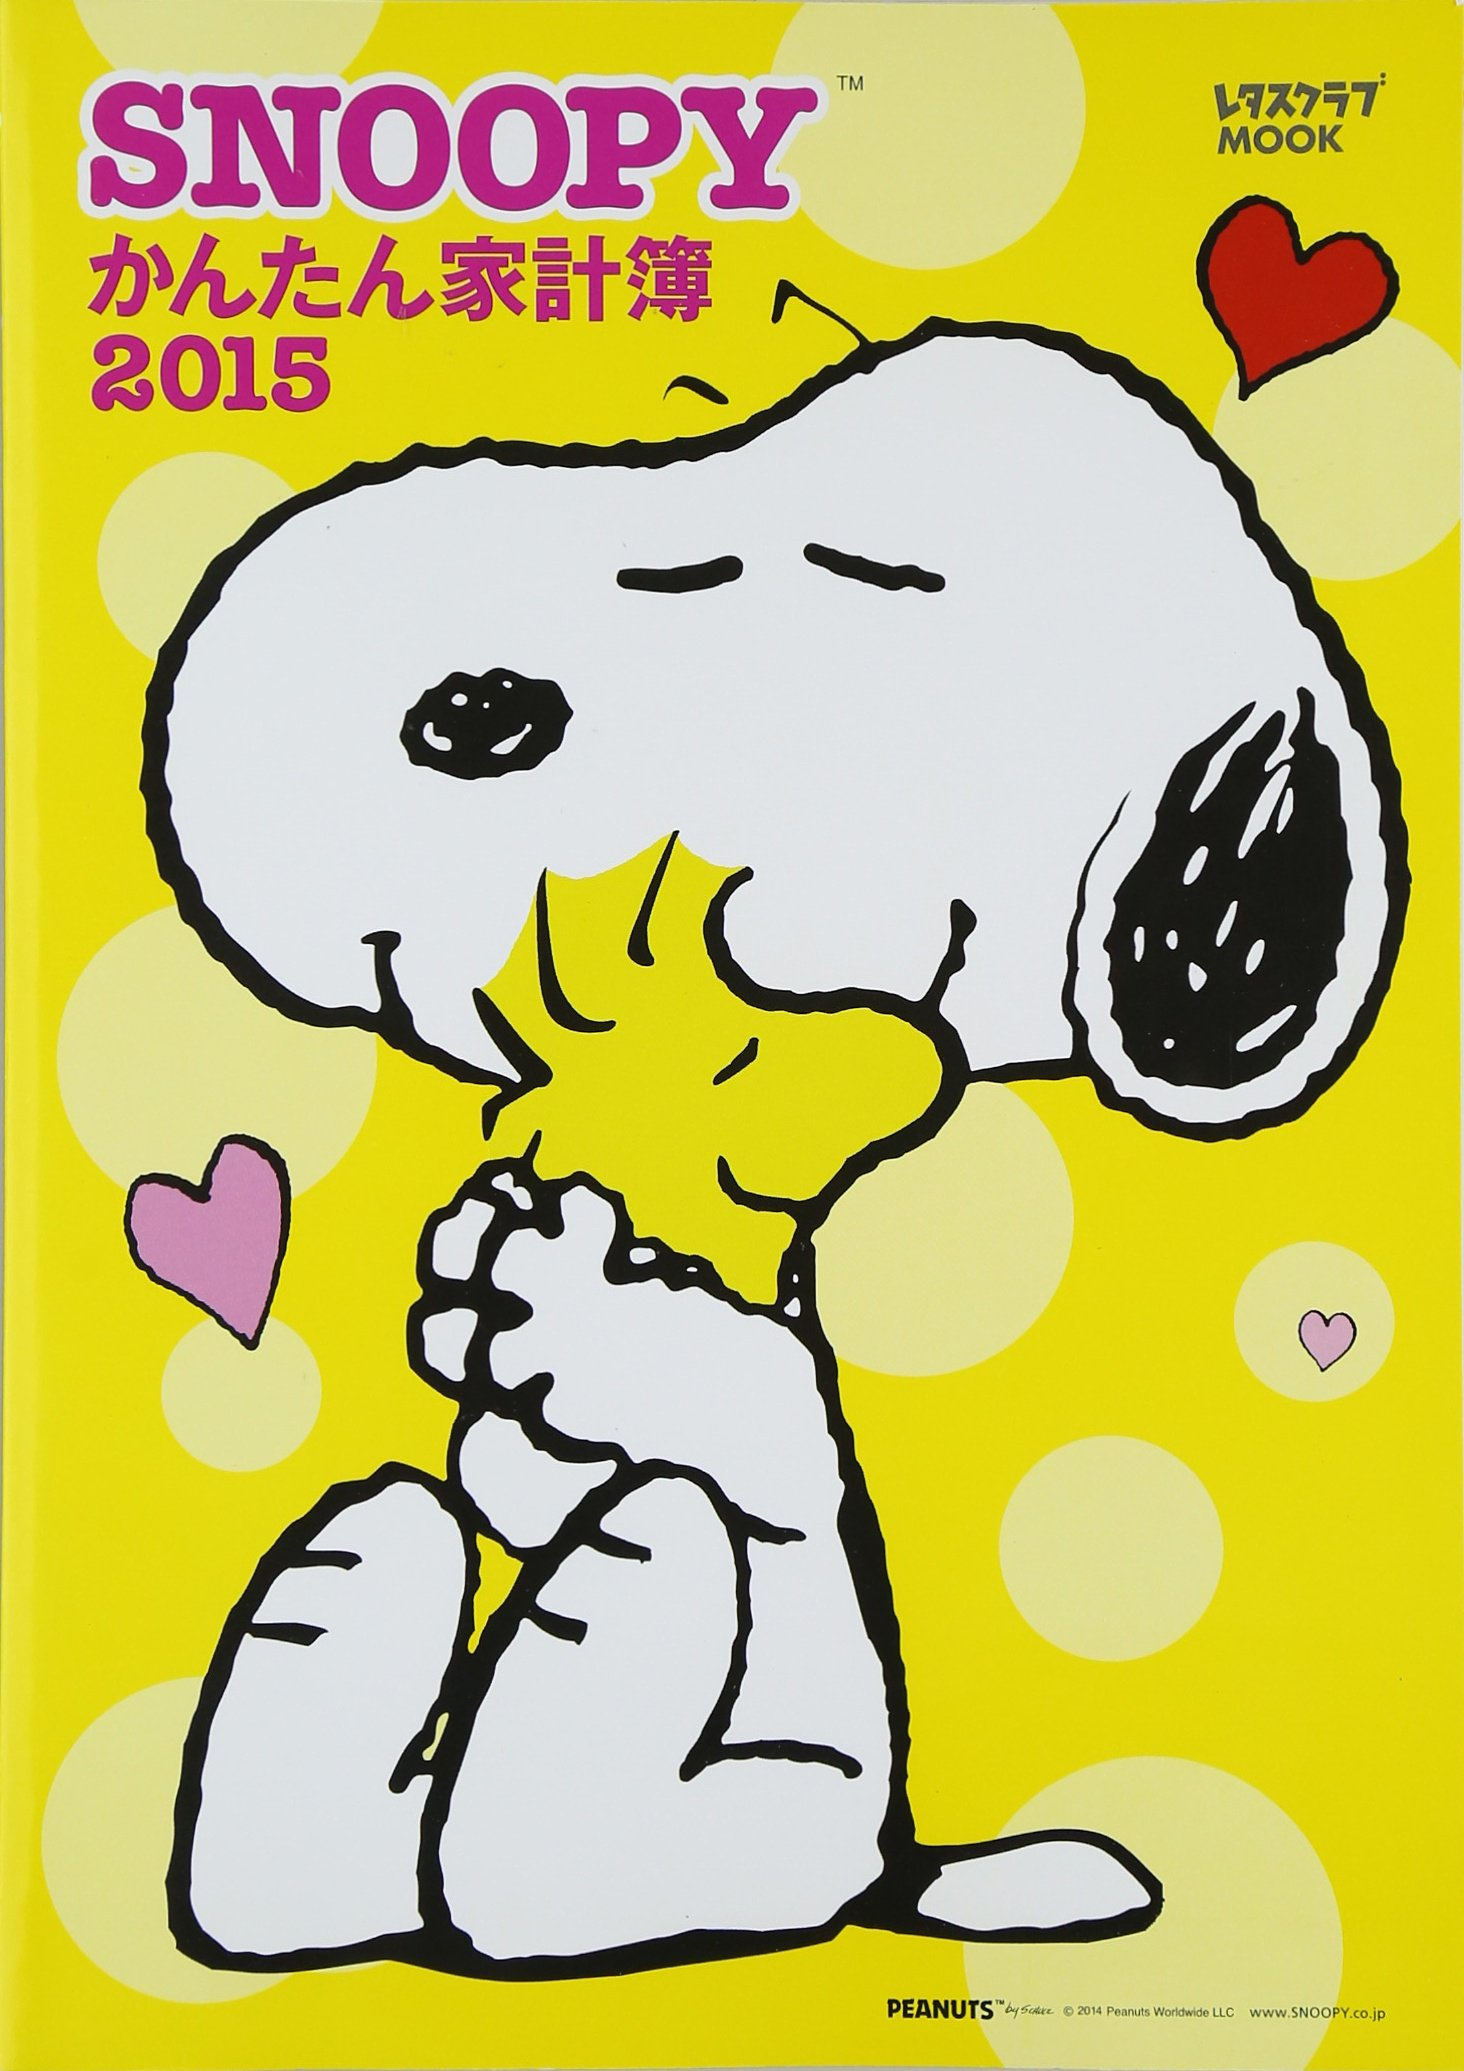 Snoopyかんたん家計簿2015なら3項目だけだしスヌーピーと一緒だから